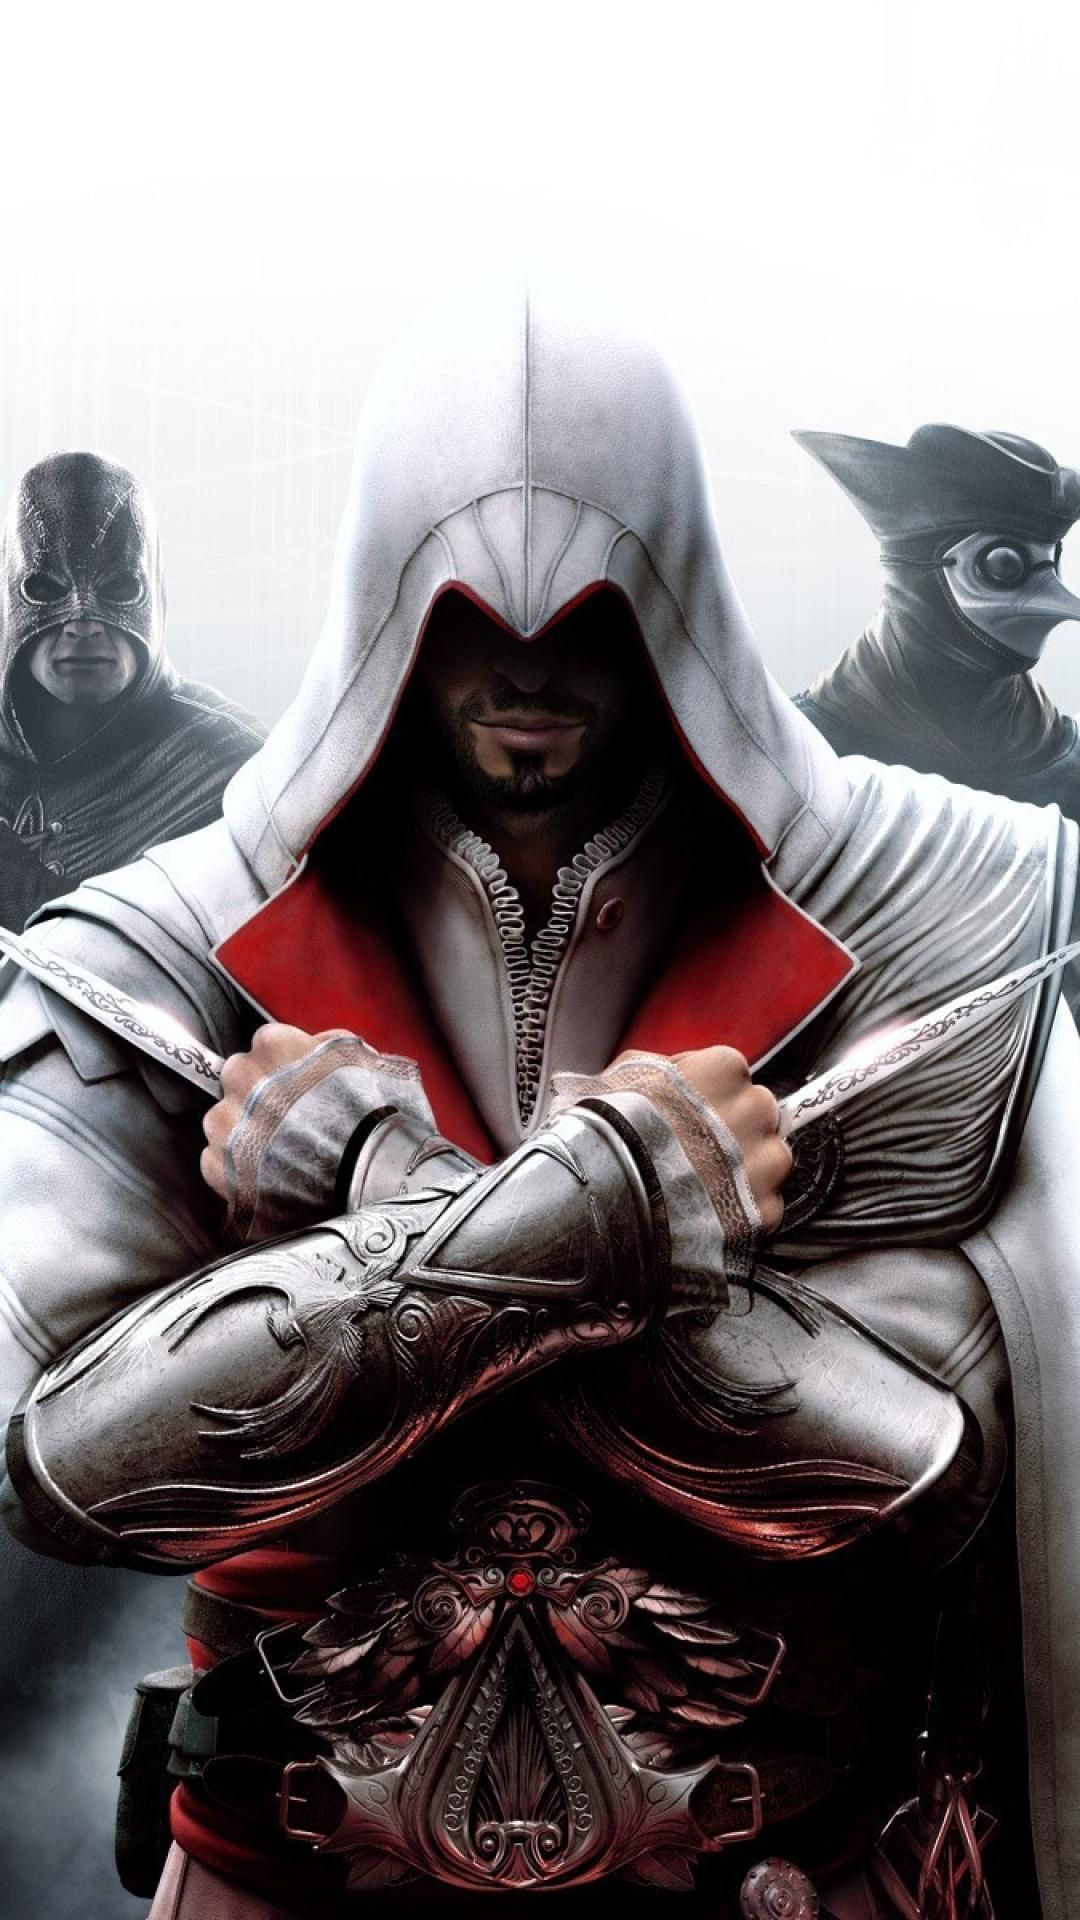 Assassins Creed Iphone Wallpapers Top Free Assassins